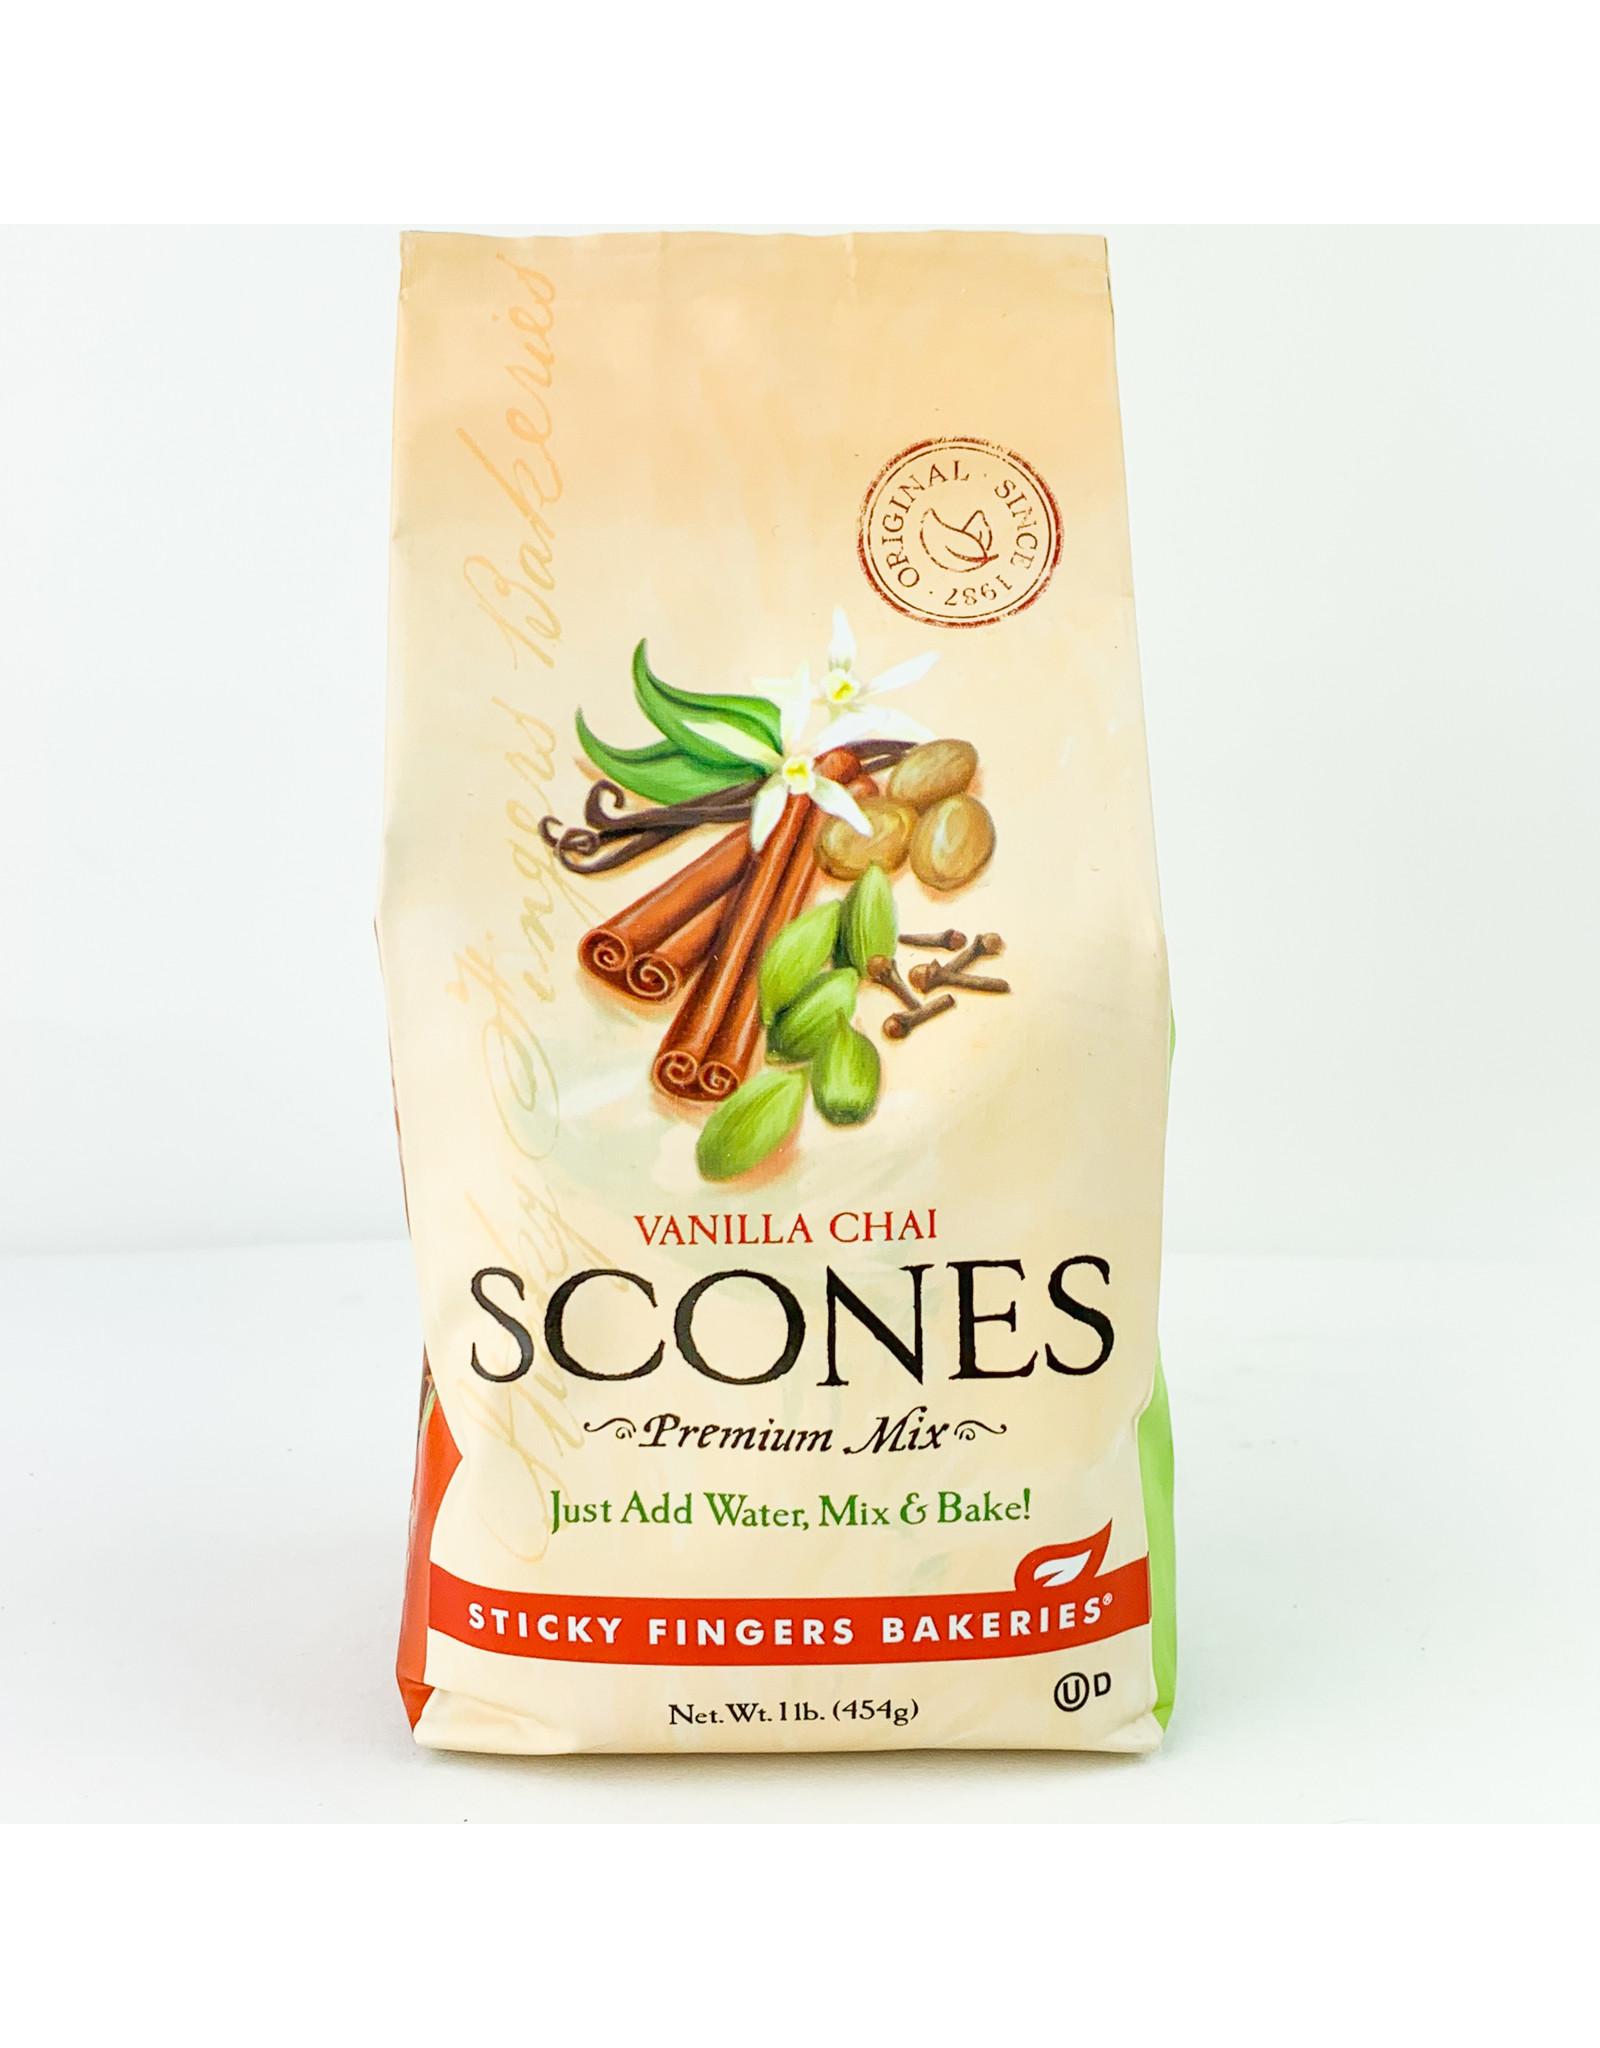 Sticky Fingers Bakeries Vanilla Chai Scone